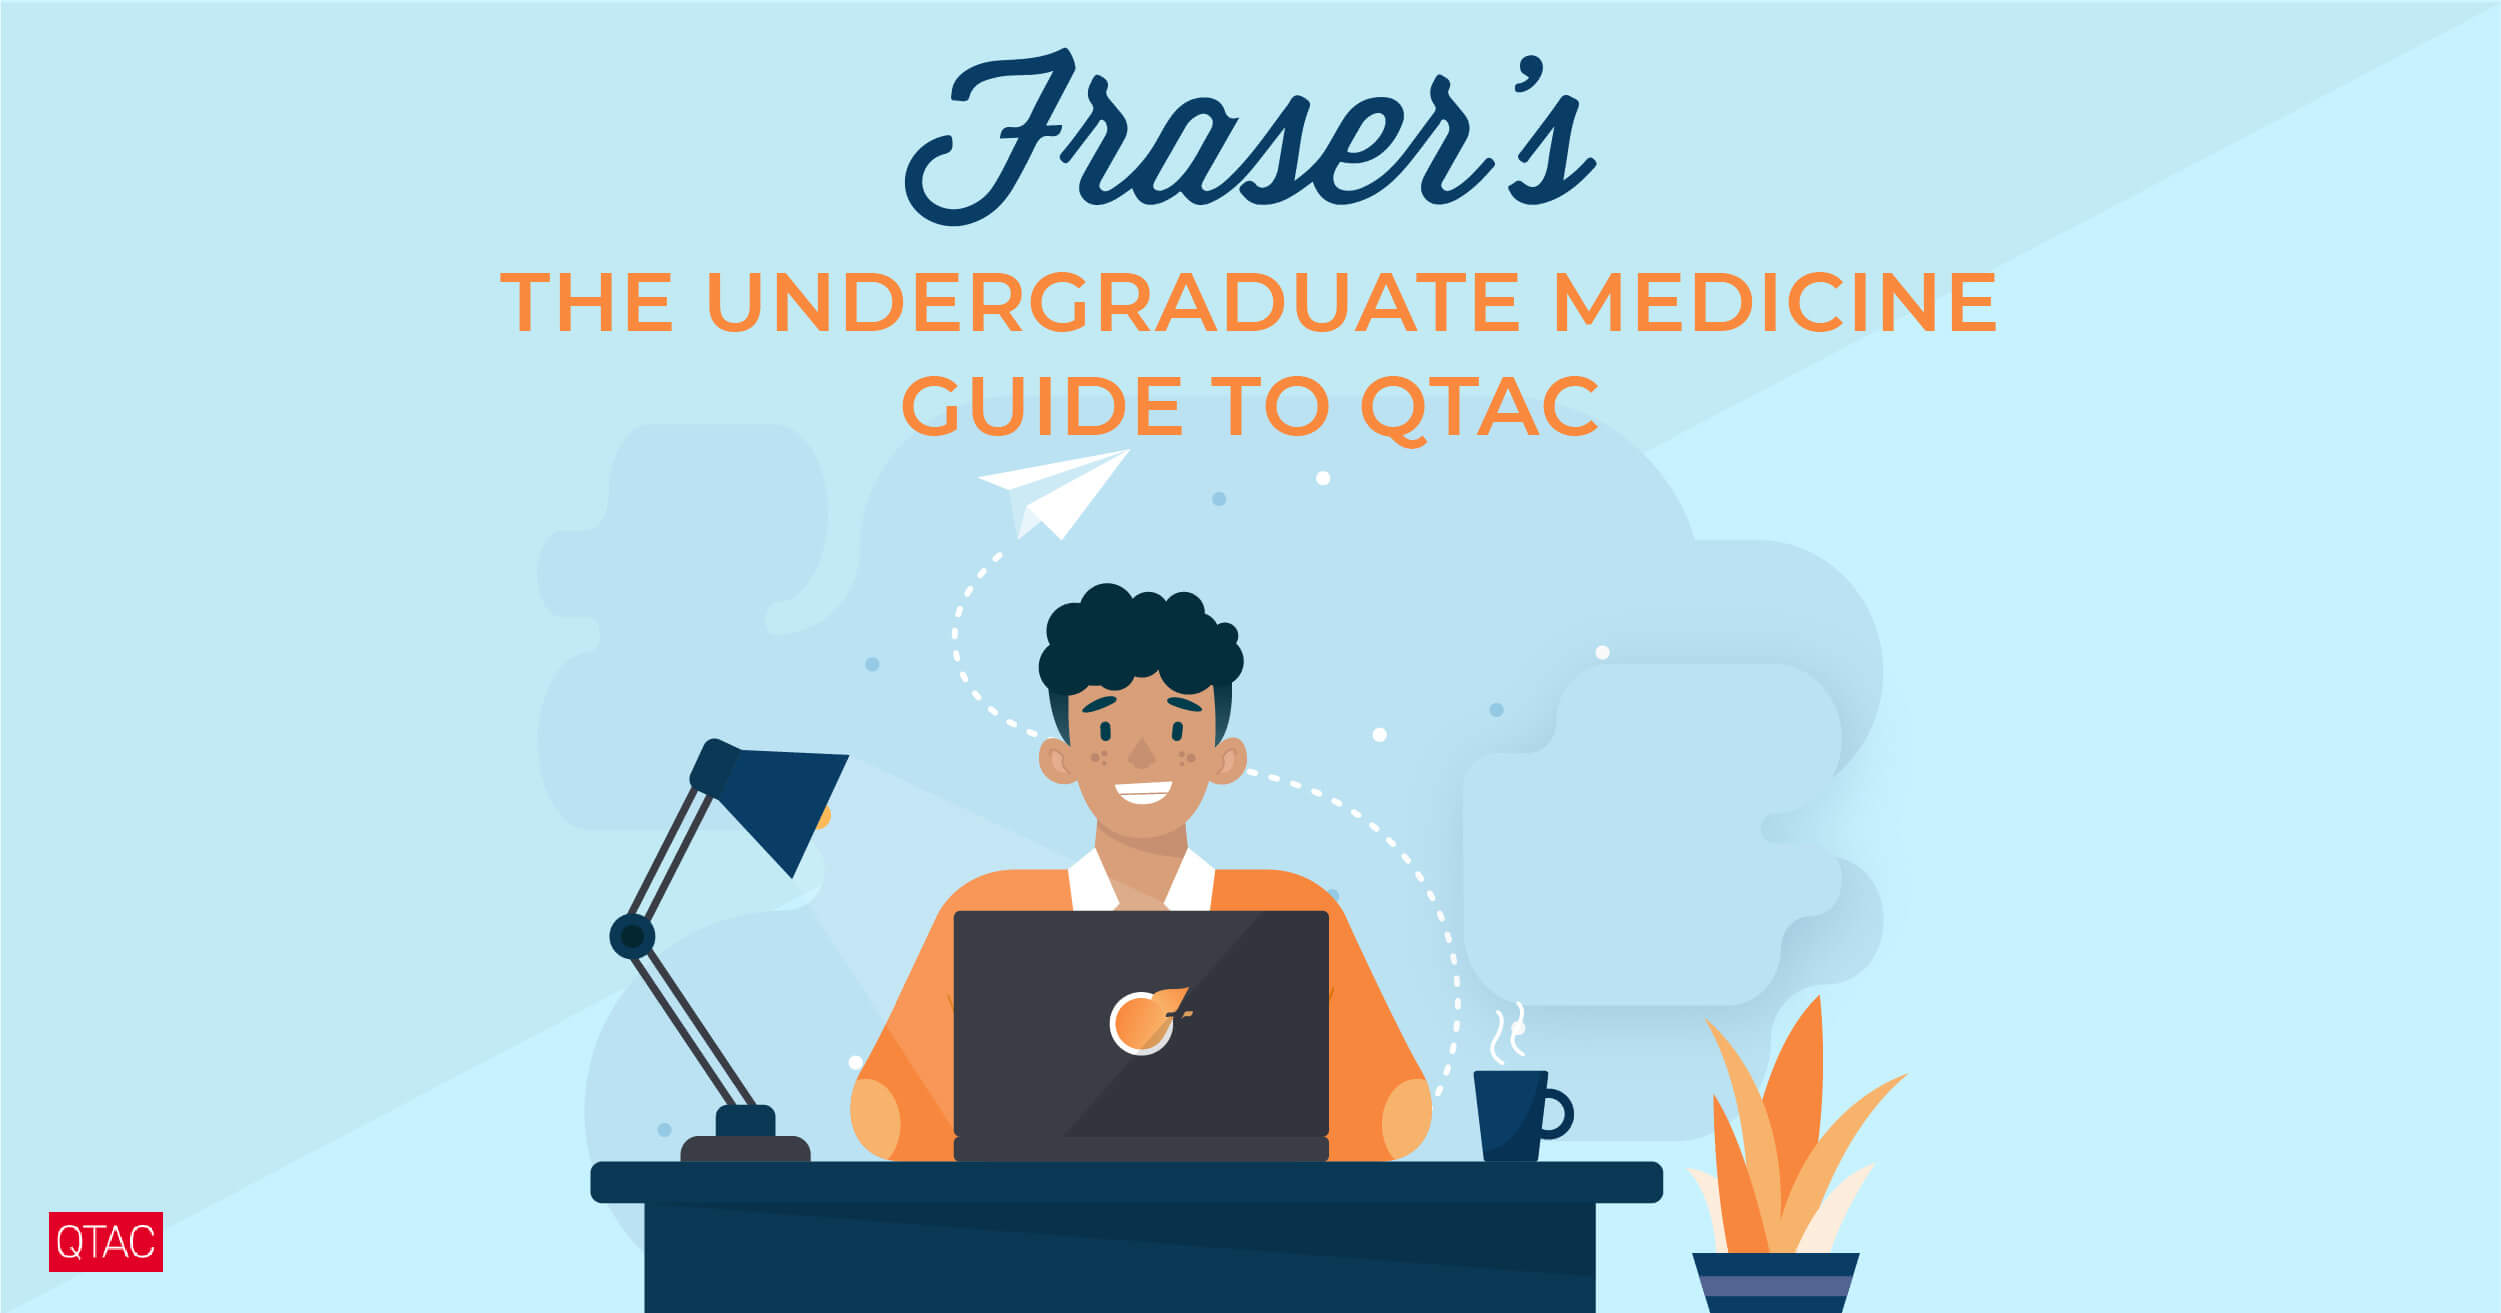 Undergraduate medicine guide to QTAC (Queensland Tertiary Admissions Centre)